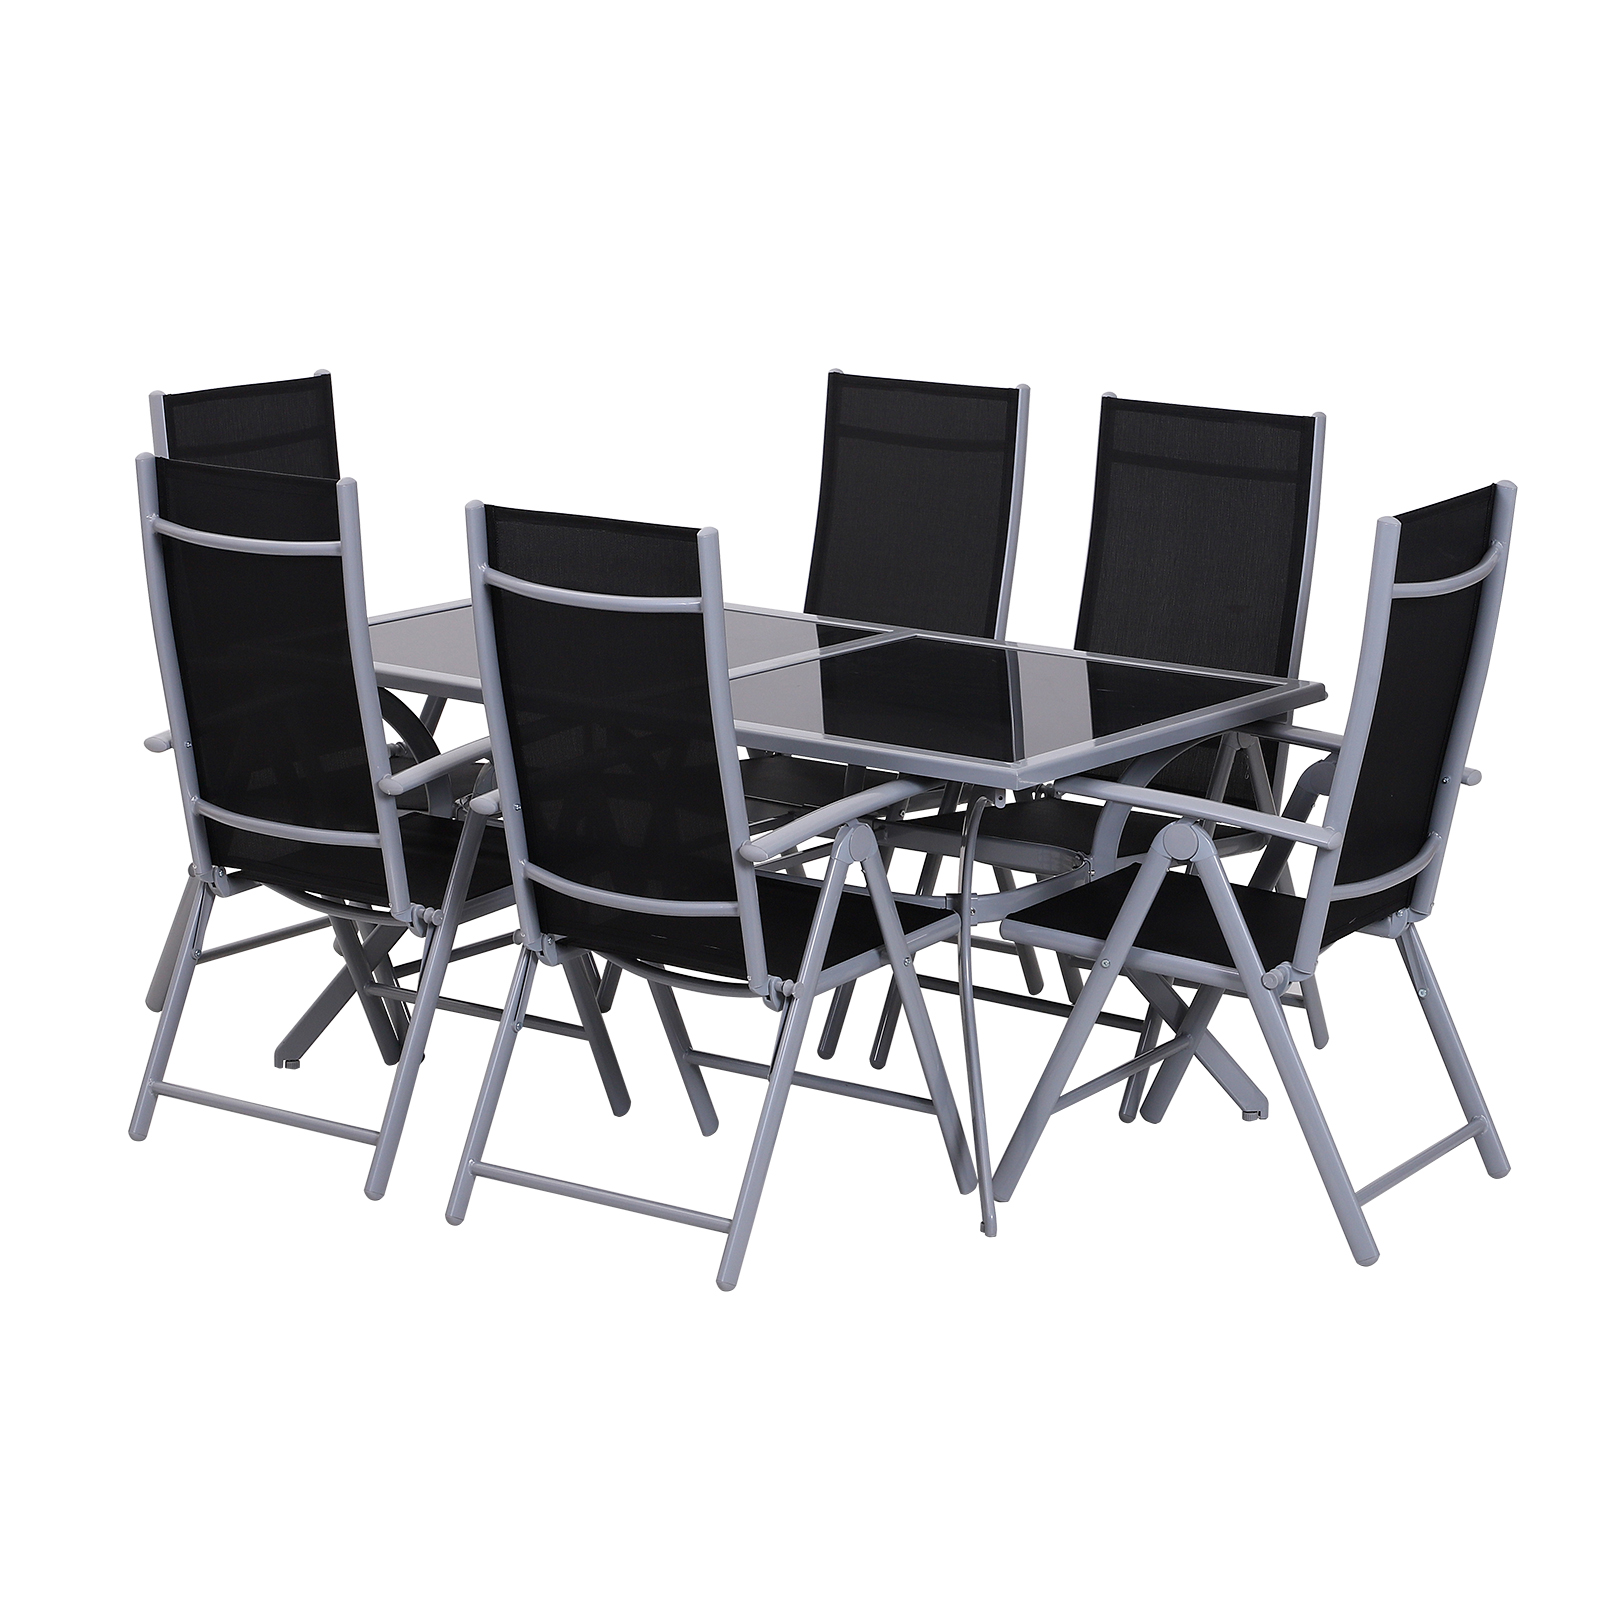 Outsunny Set bahçe mobilya masa 6 sandalye ile geri ila 7 kat yapı patentli